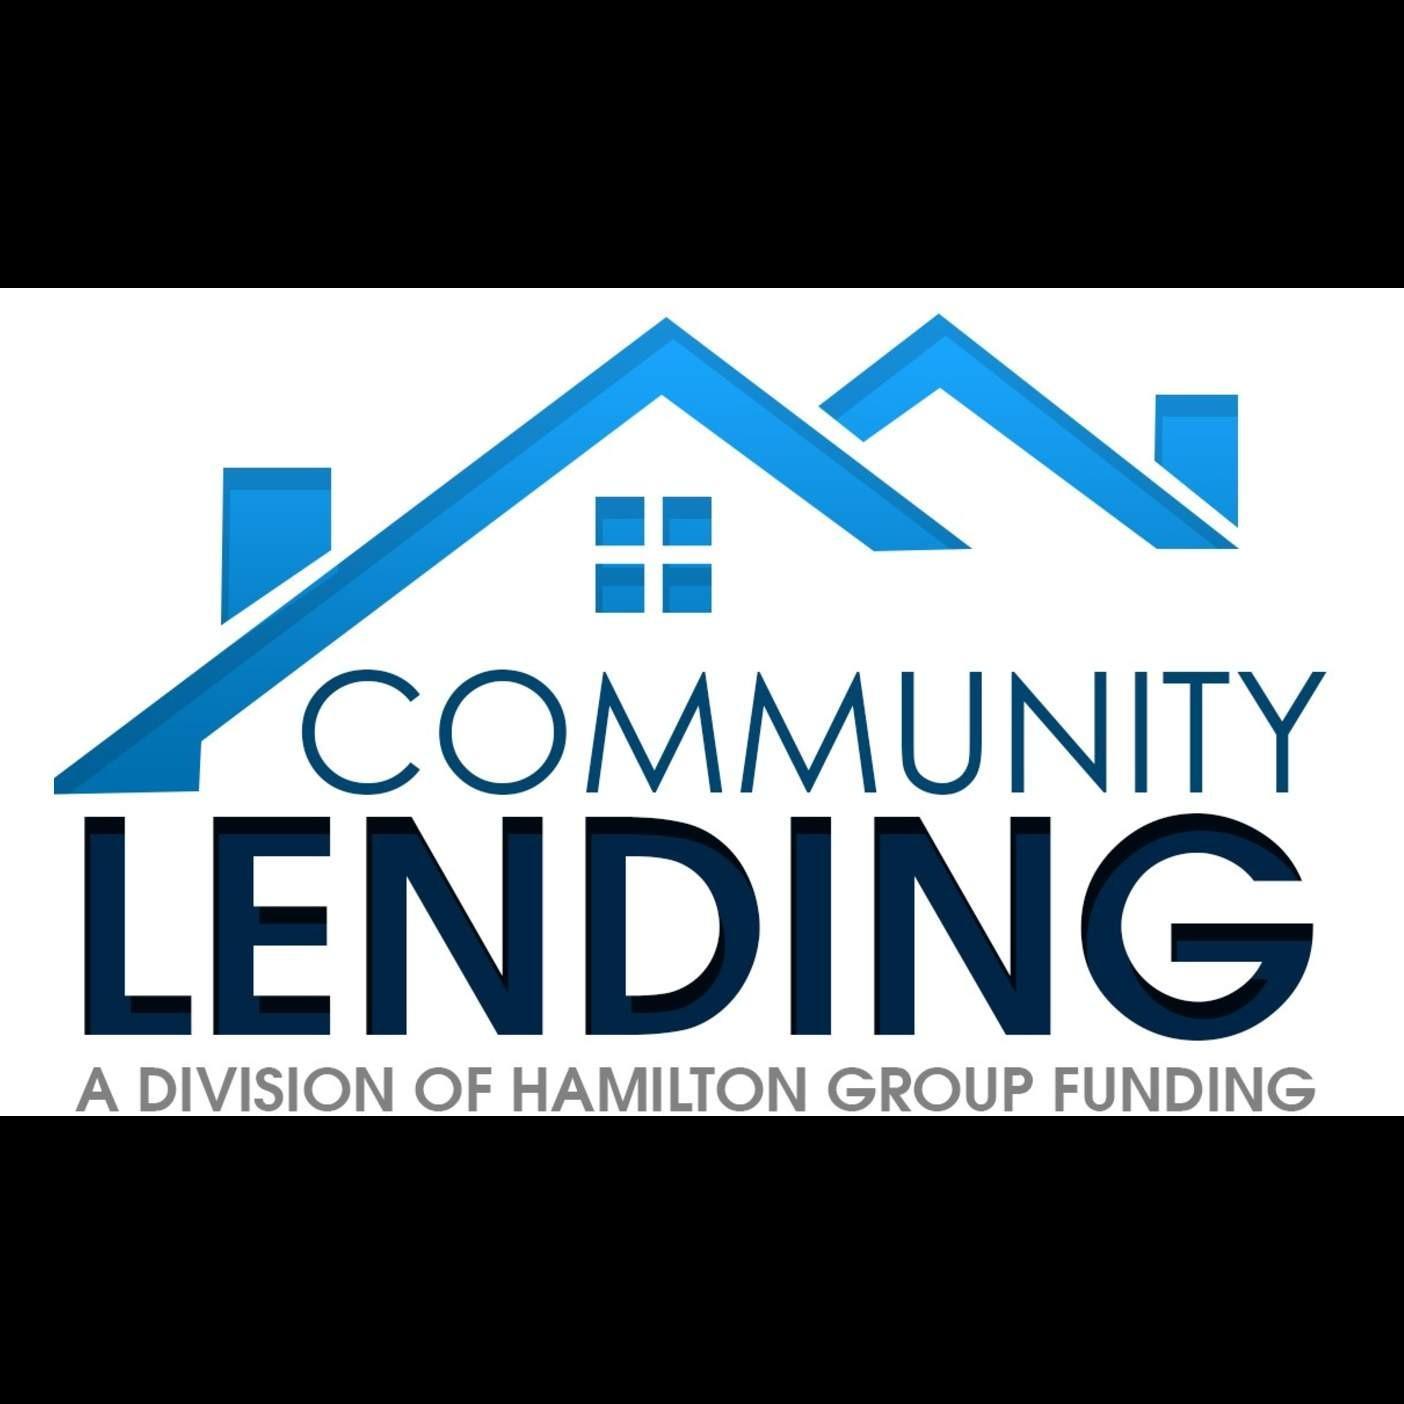 Tara Hoopmann | Community Lending, A Division of Hamilton Group Funding image 2